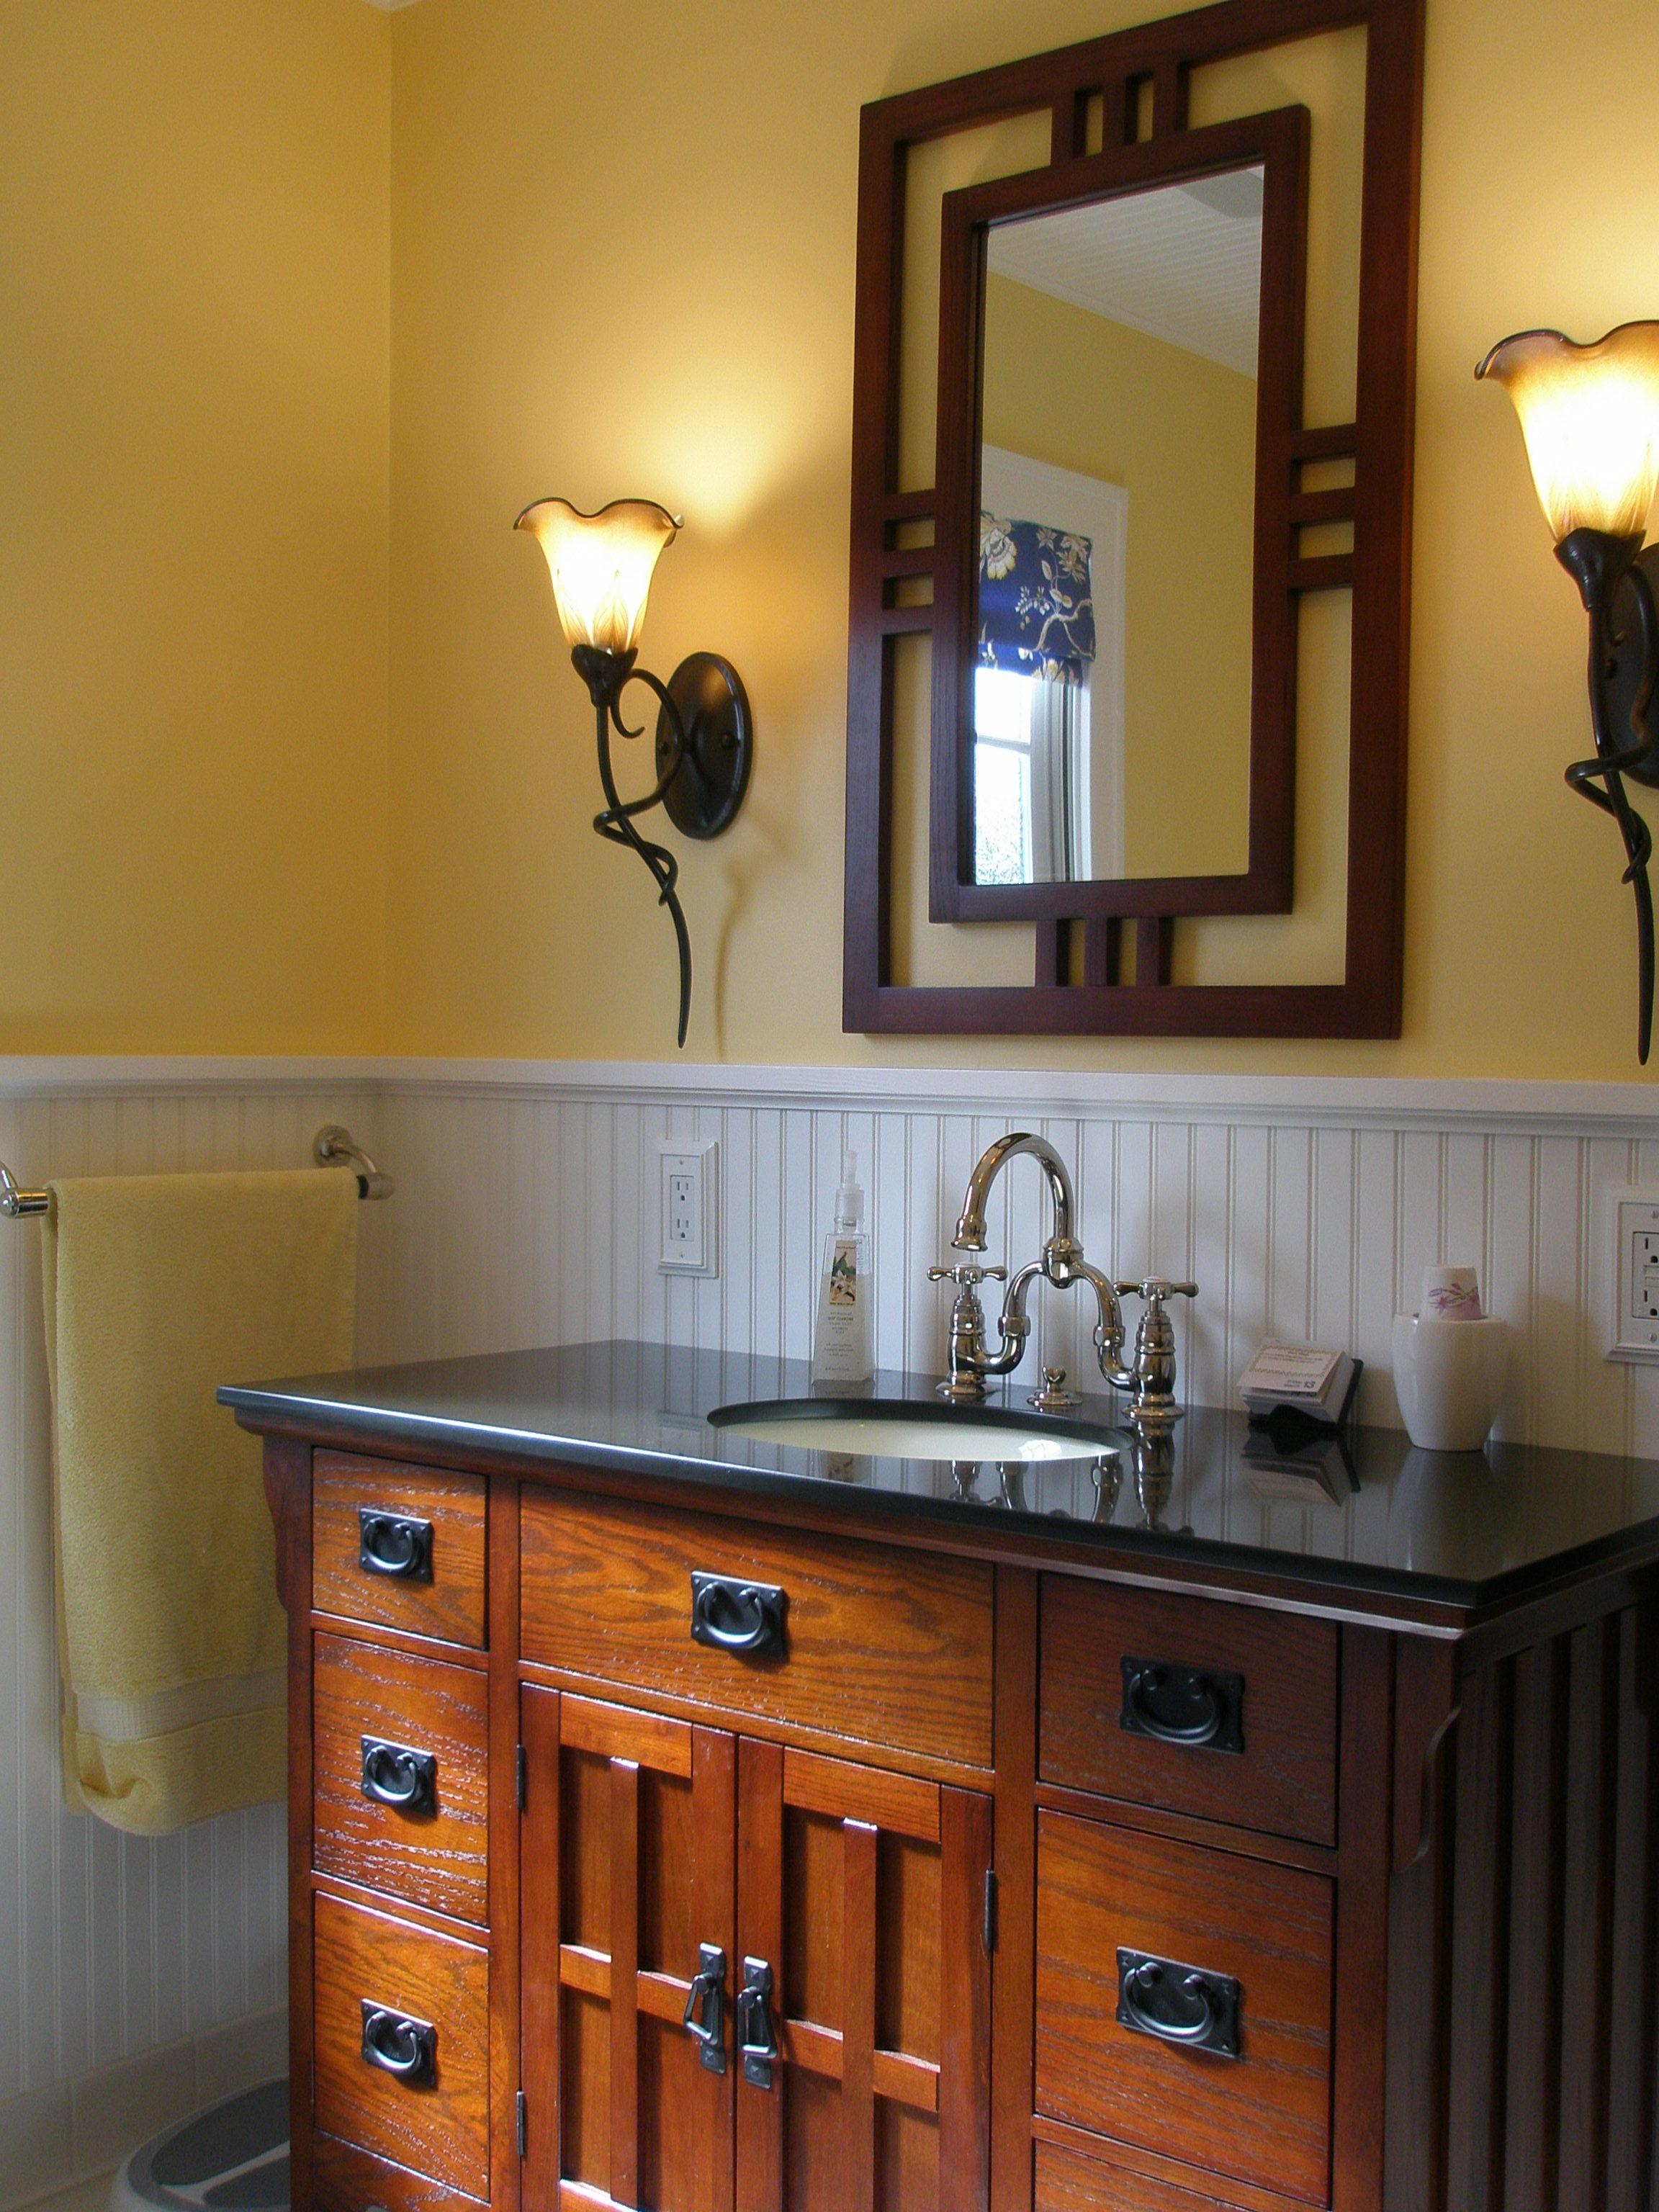 still have an inkling to go this way see tile ideas on fantasy bathroom ideas board bathroom craftsman vanitymirror